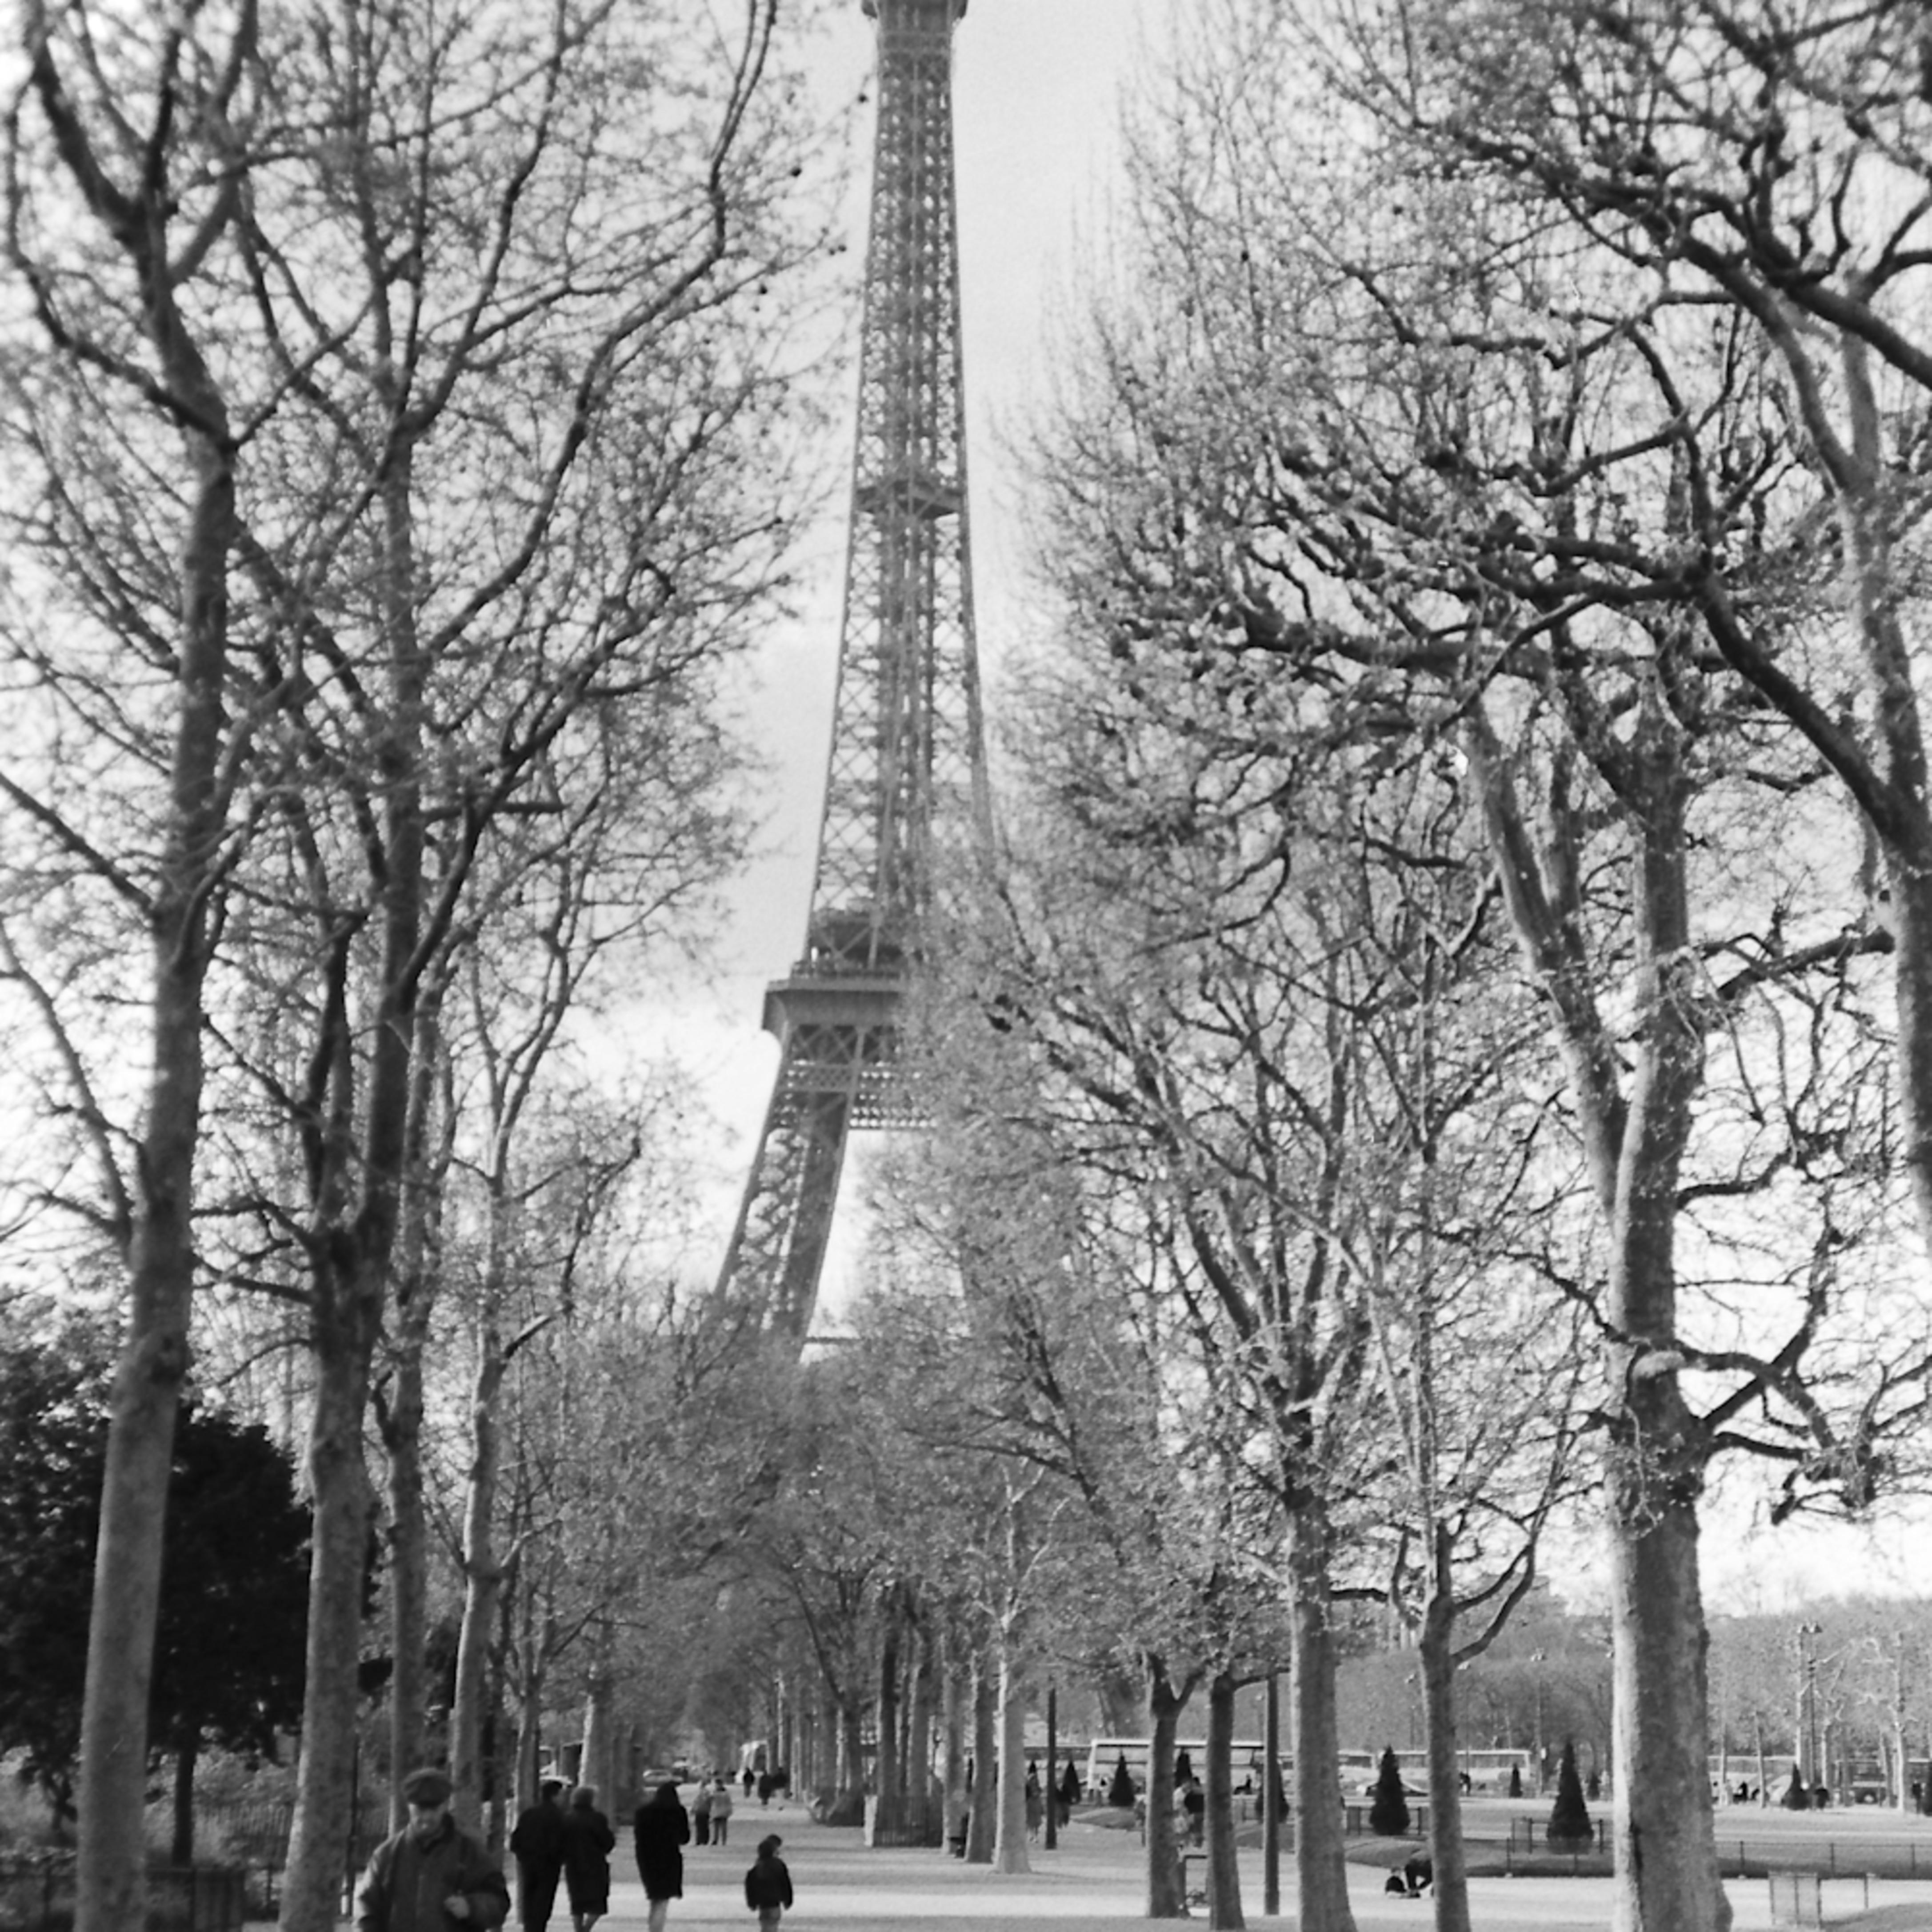 La tour eiffel acicph